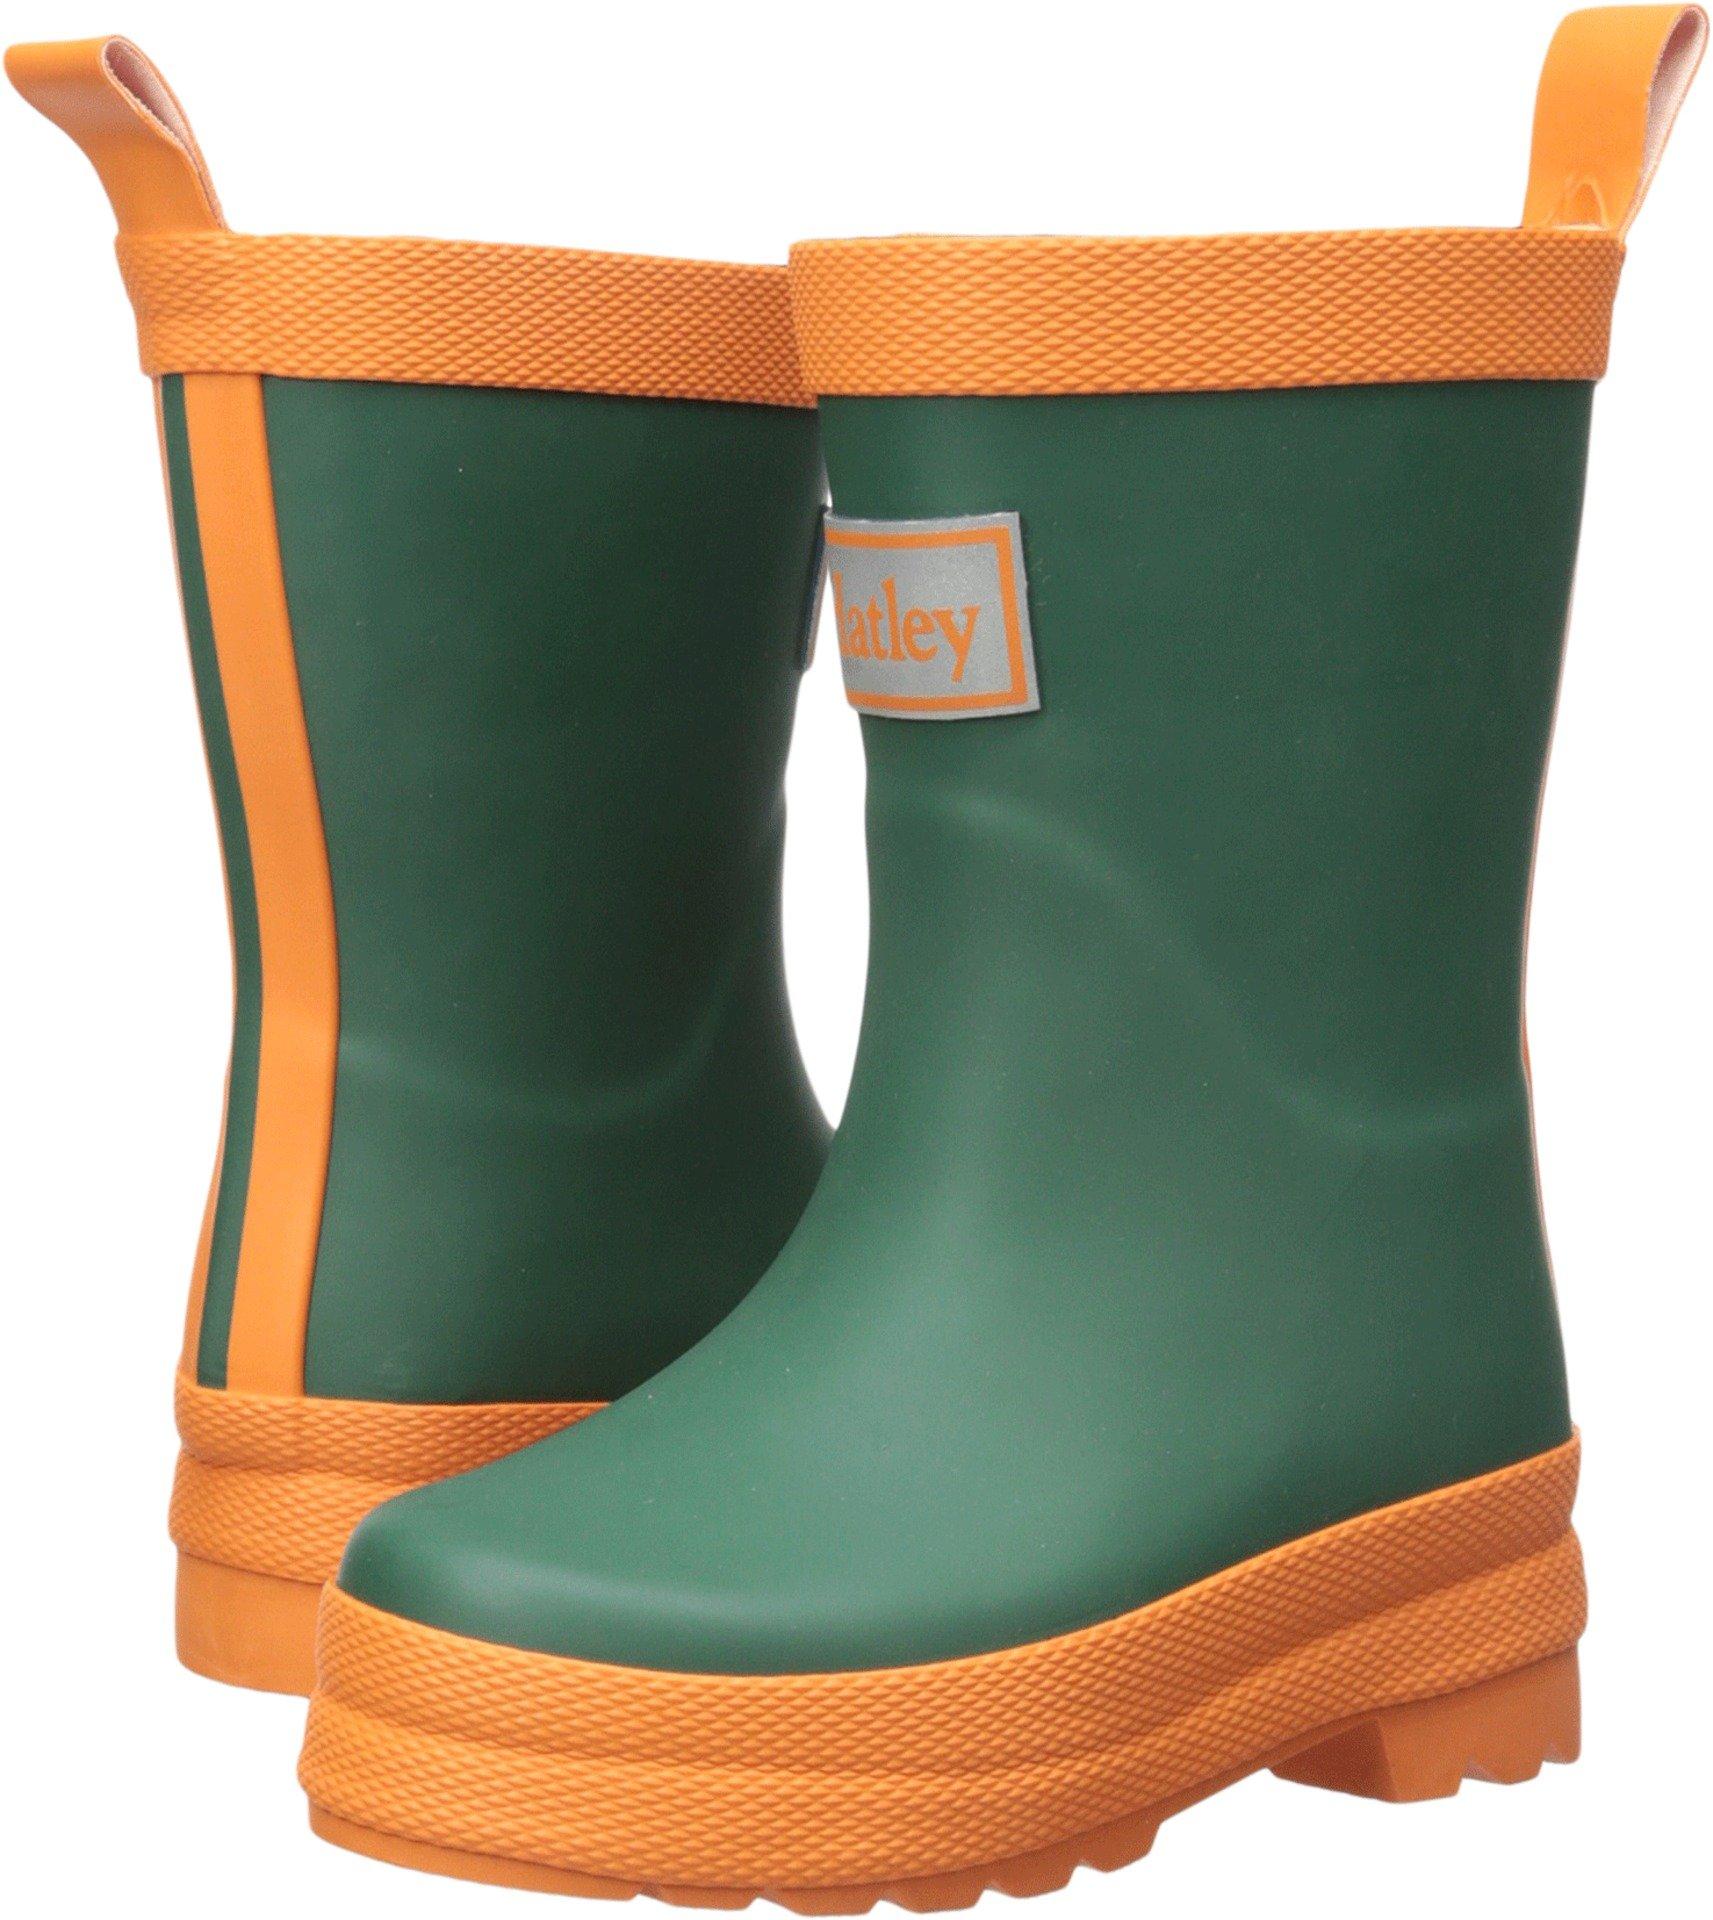 Hatley Classic Boots Rain Accessory, Green and Orange, 8 M US Little Kid